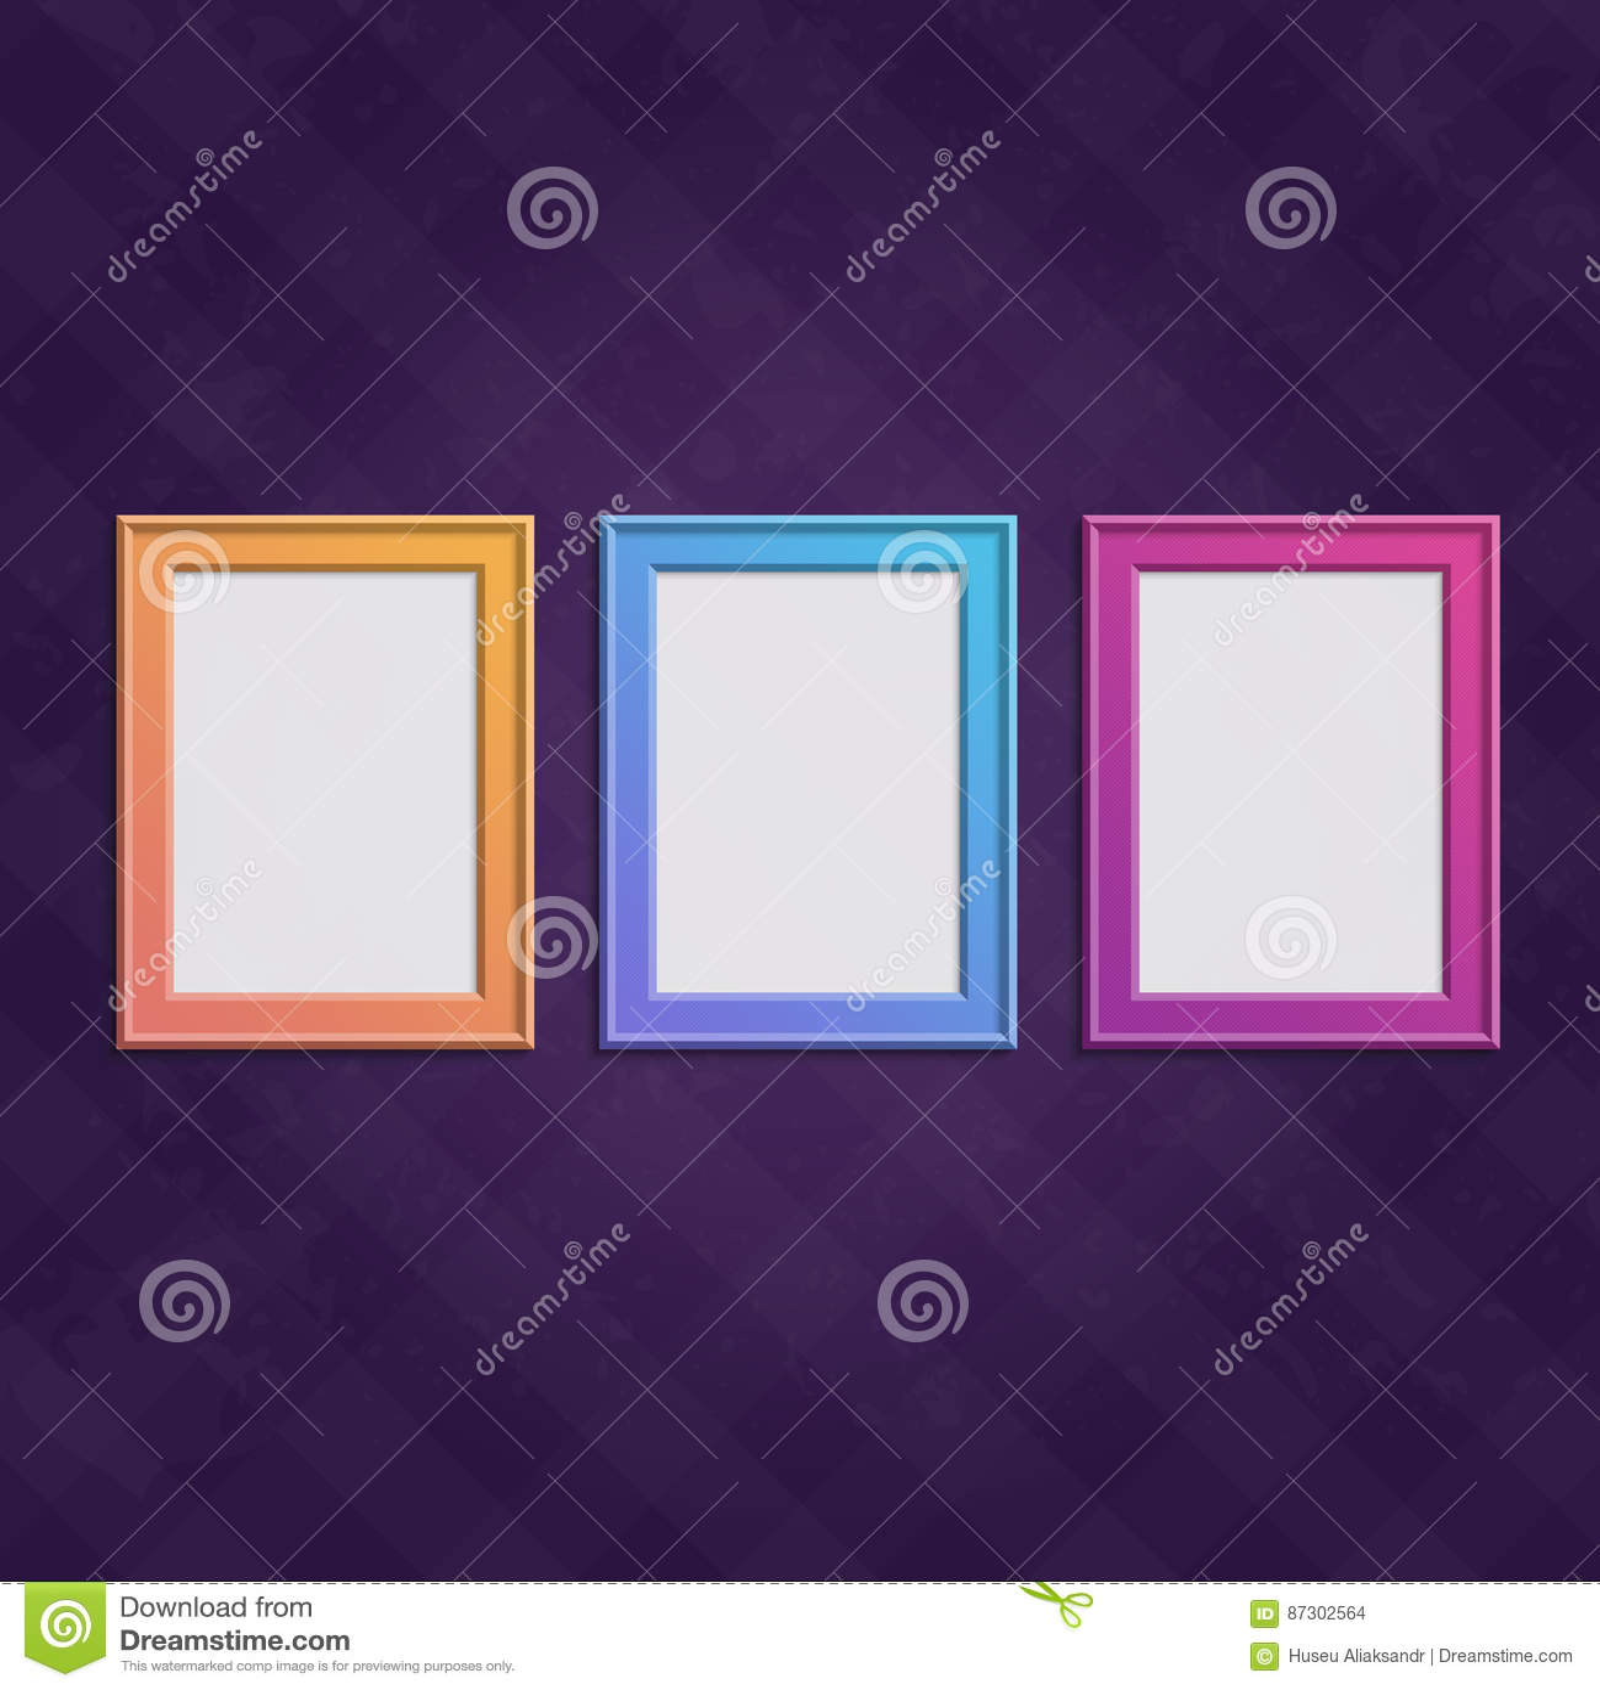 Wood frames set free vector - Colored Frames Set Stock Vector